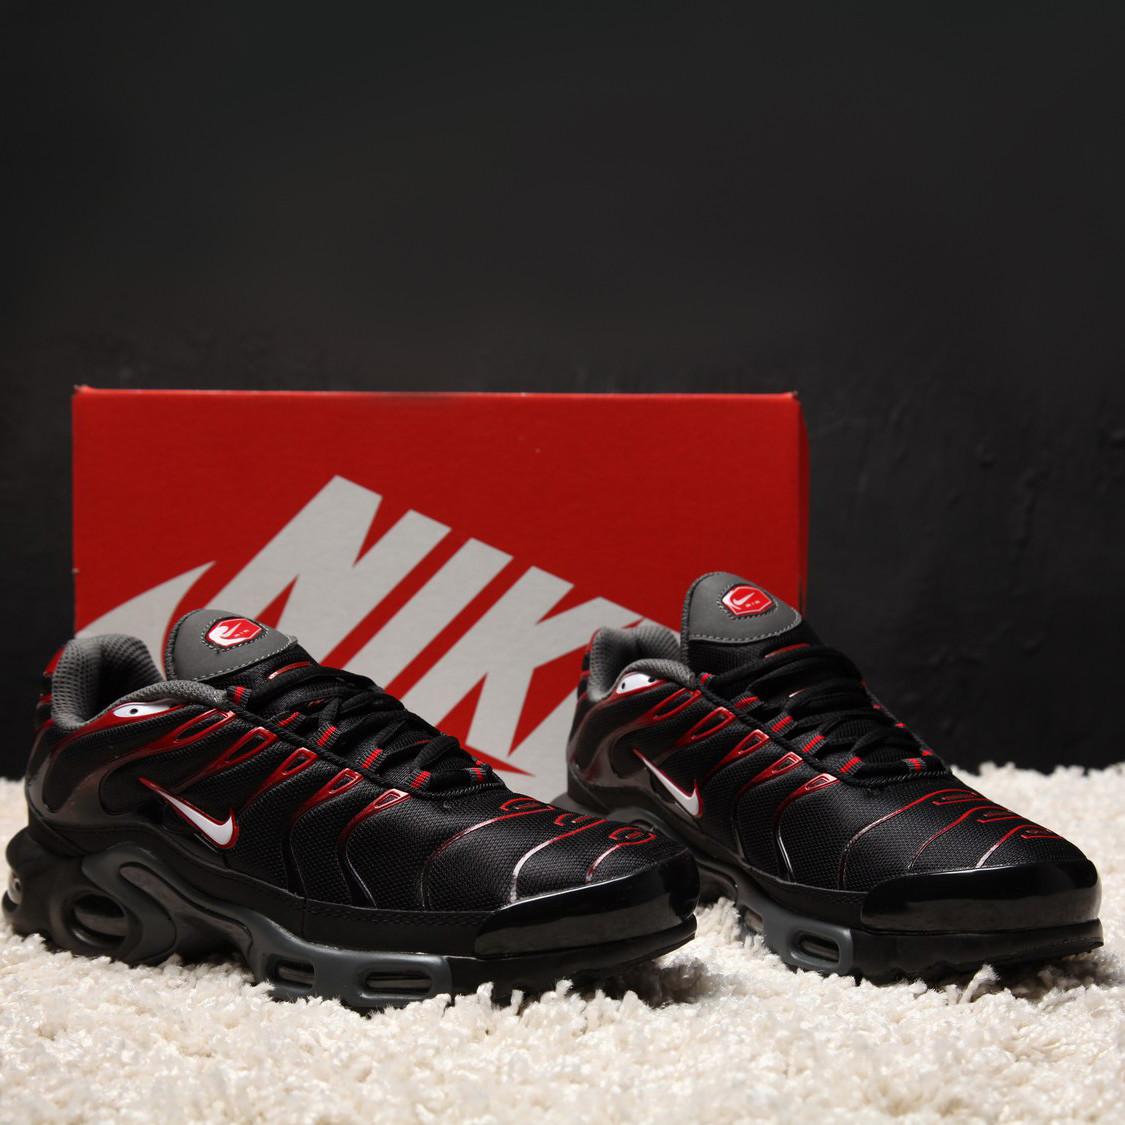 Nike Air Max Plus TN Black University Red Bred White (реплика)